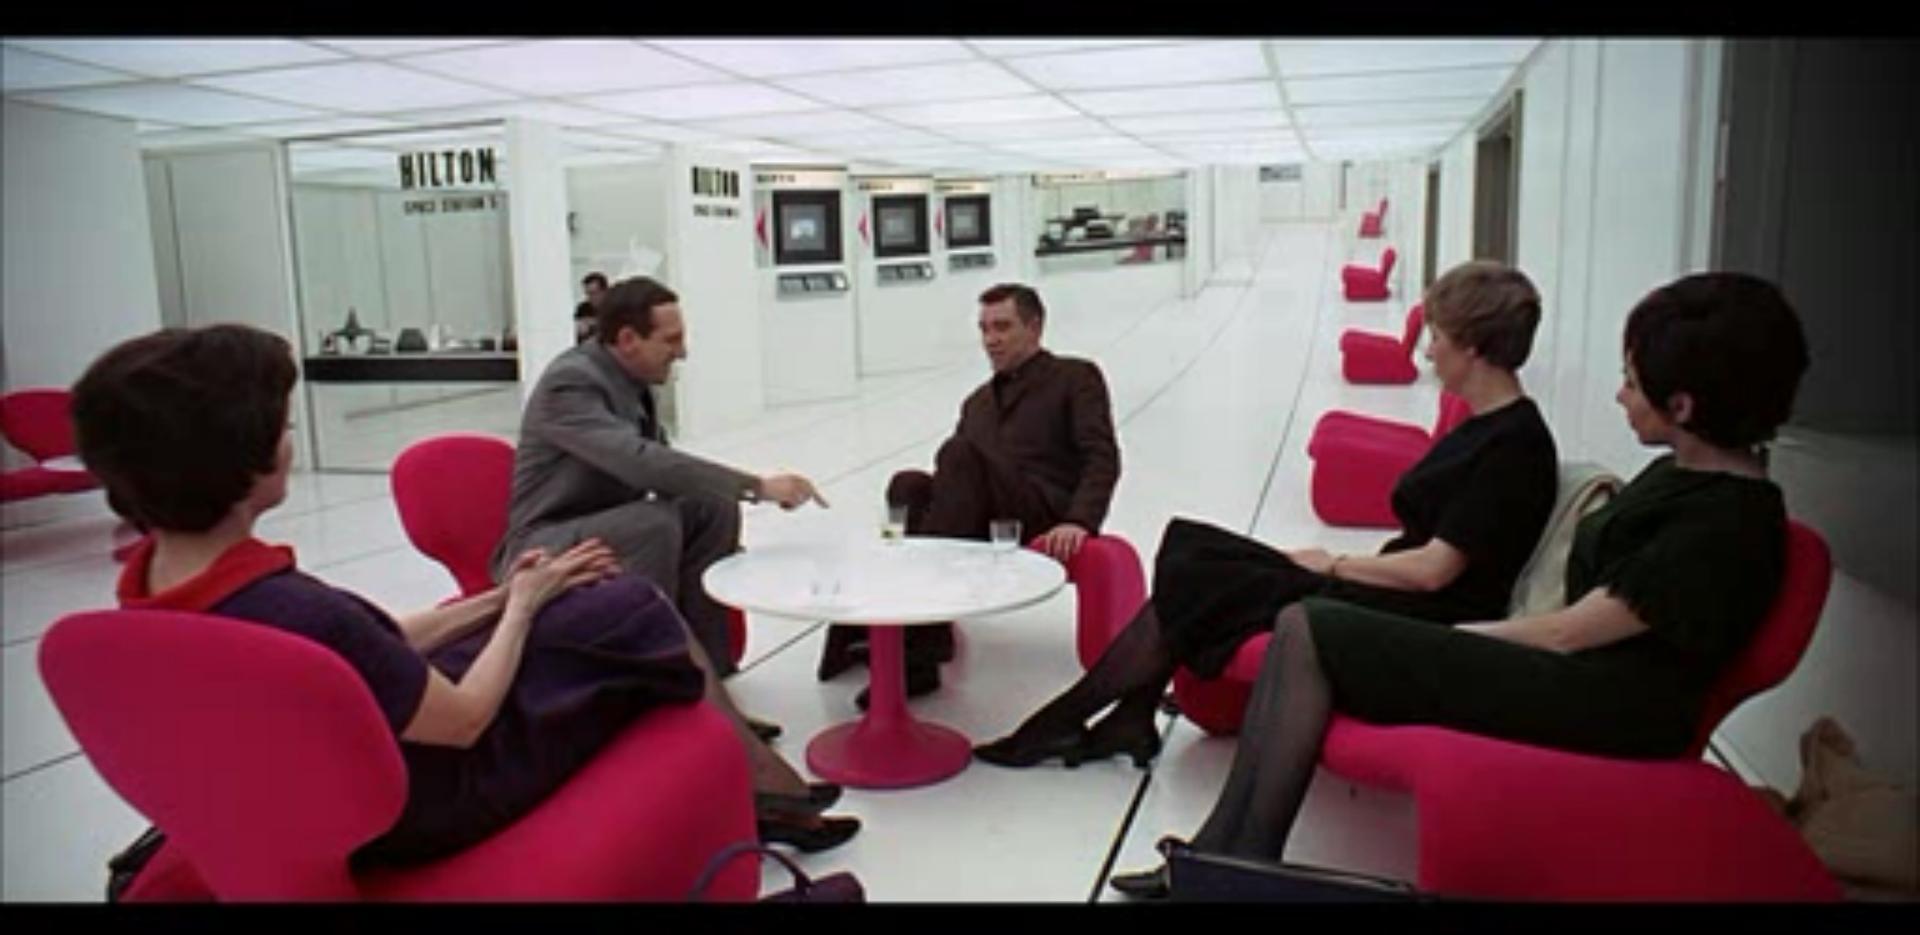 2001 a Space Odyssey - 2001 Odyssée de l'espace - Eero Saarinen - Tulip Chair - Knoll